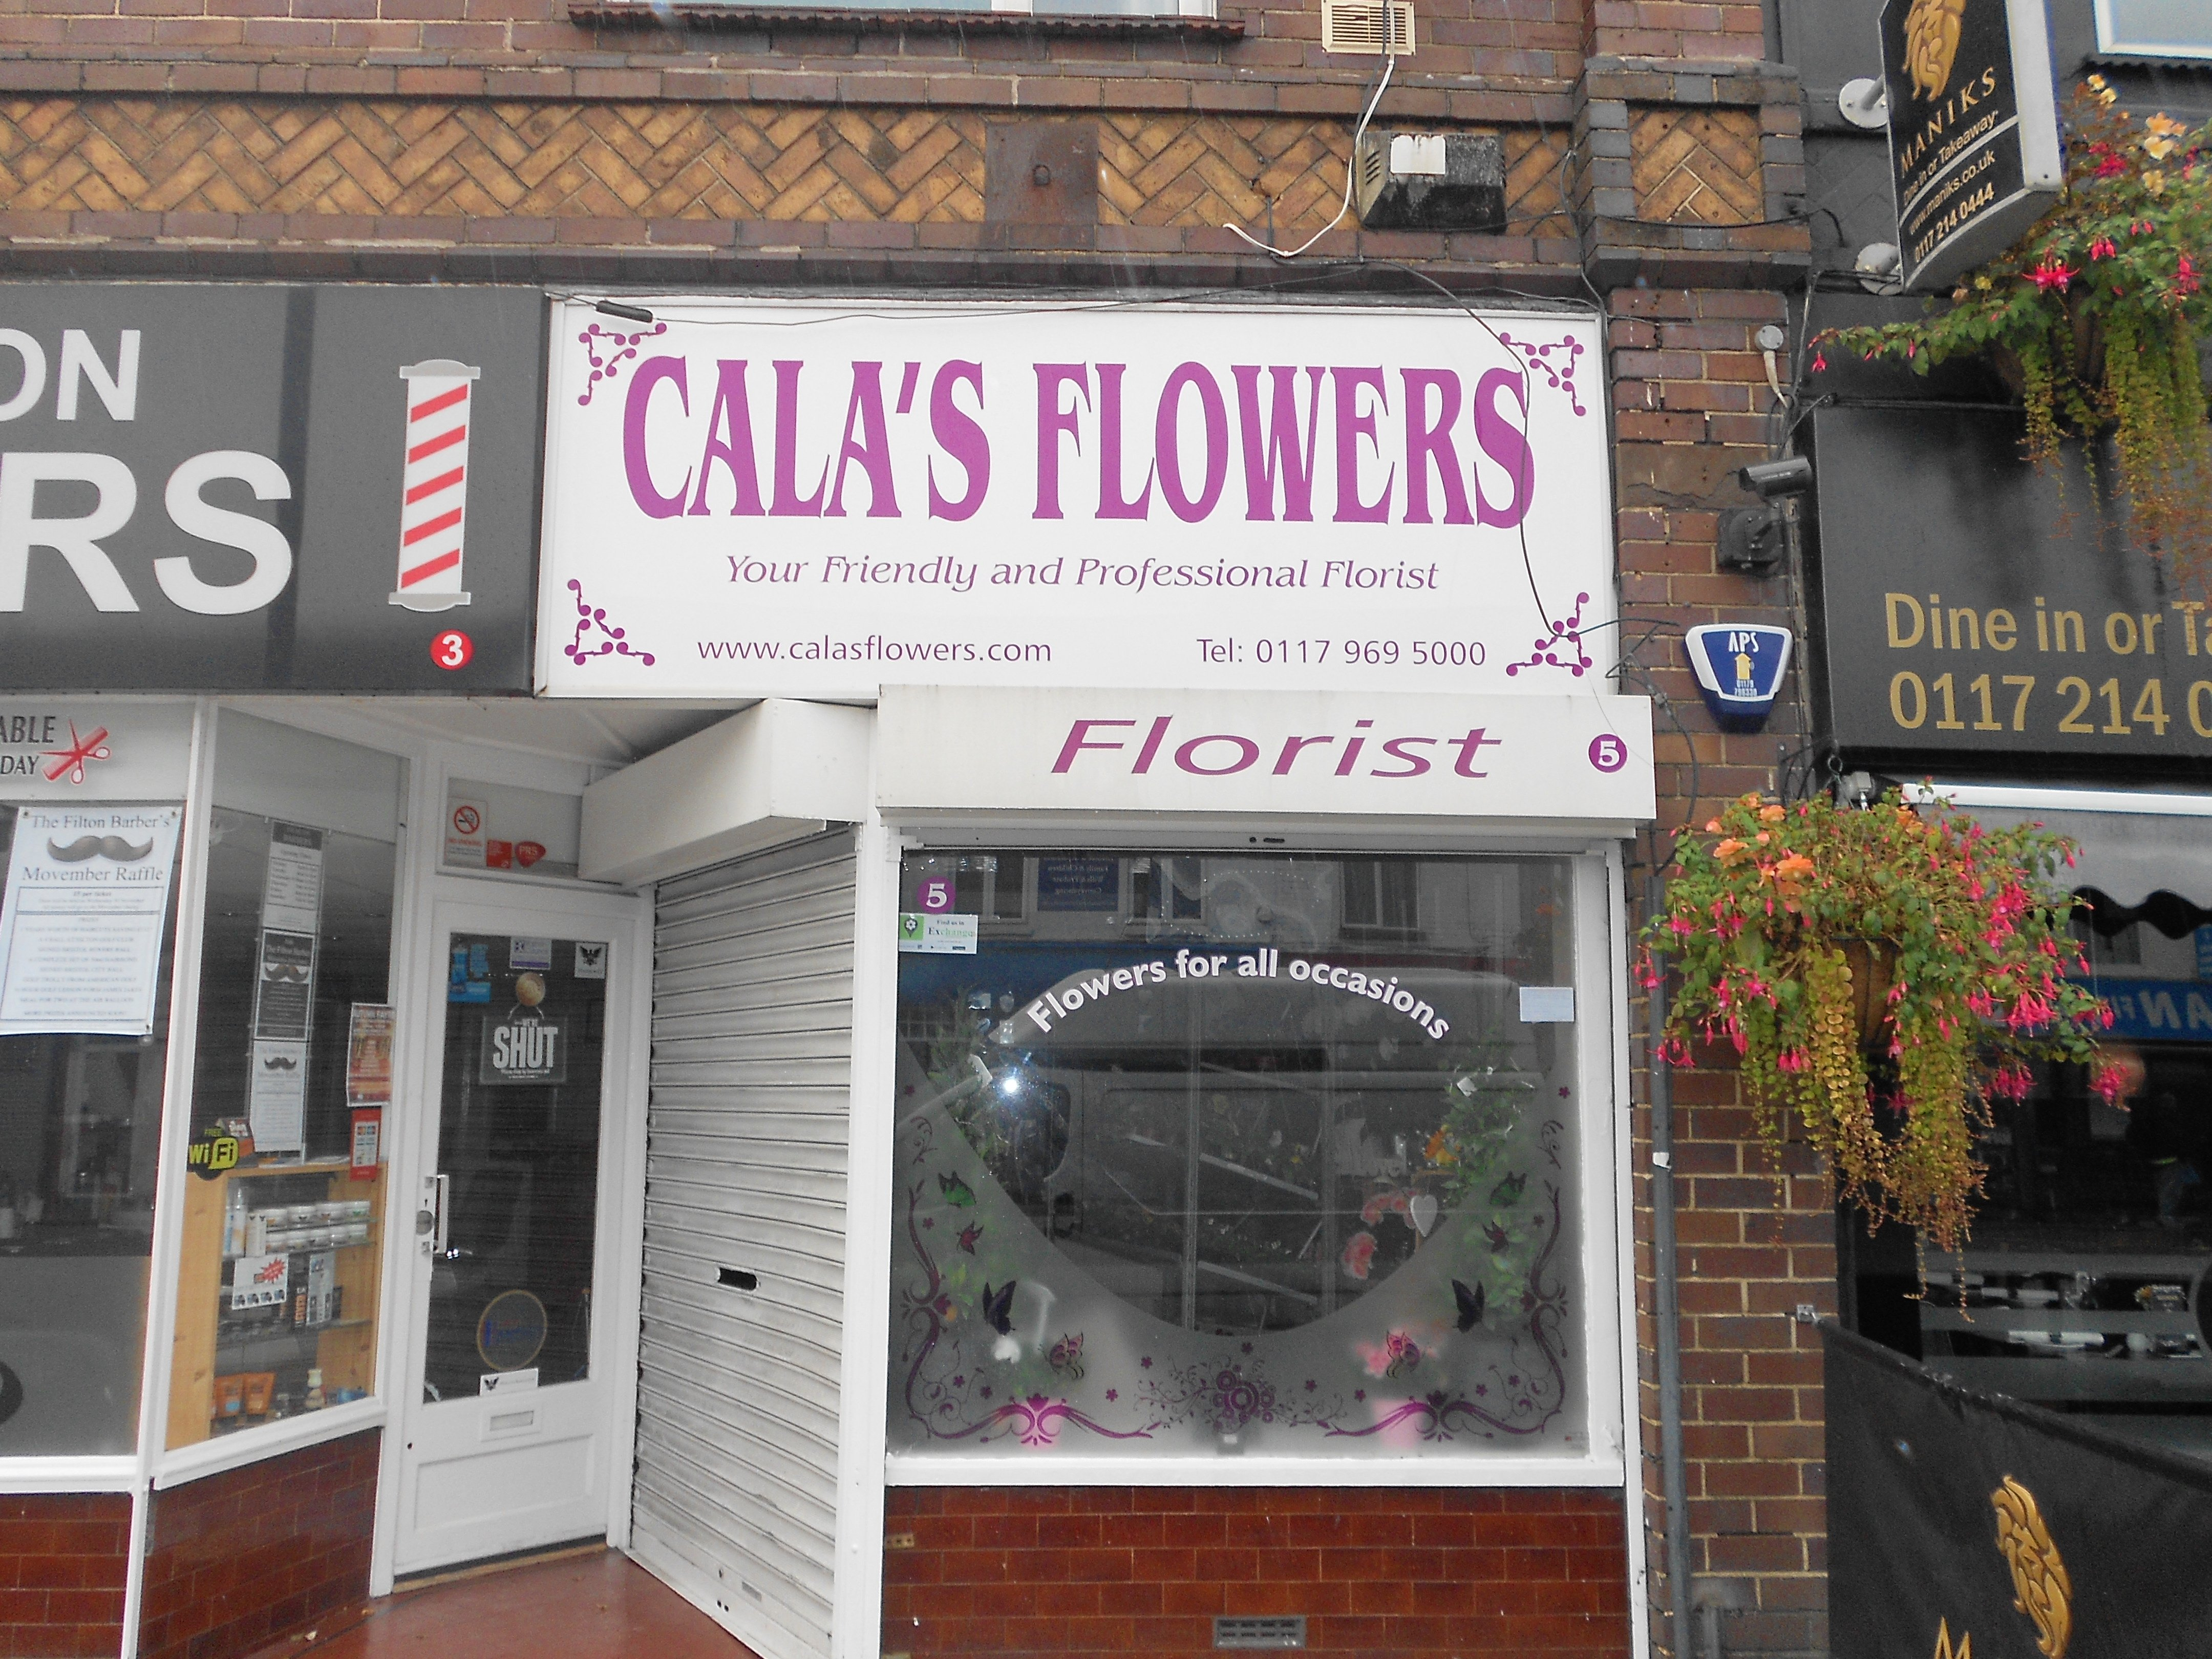 Cala's flowers